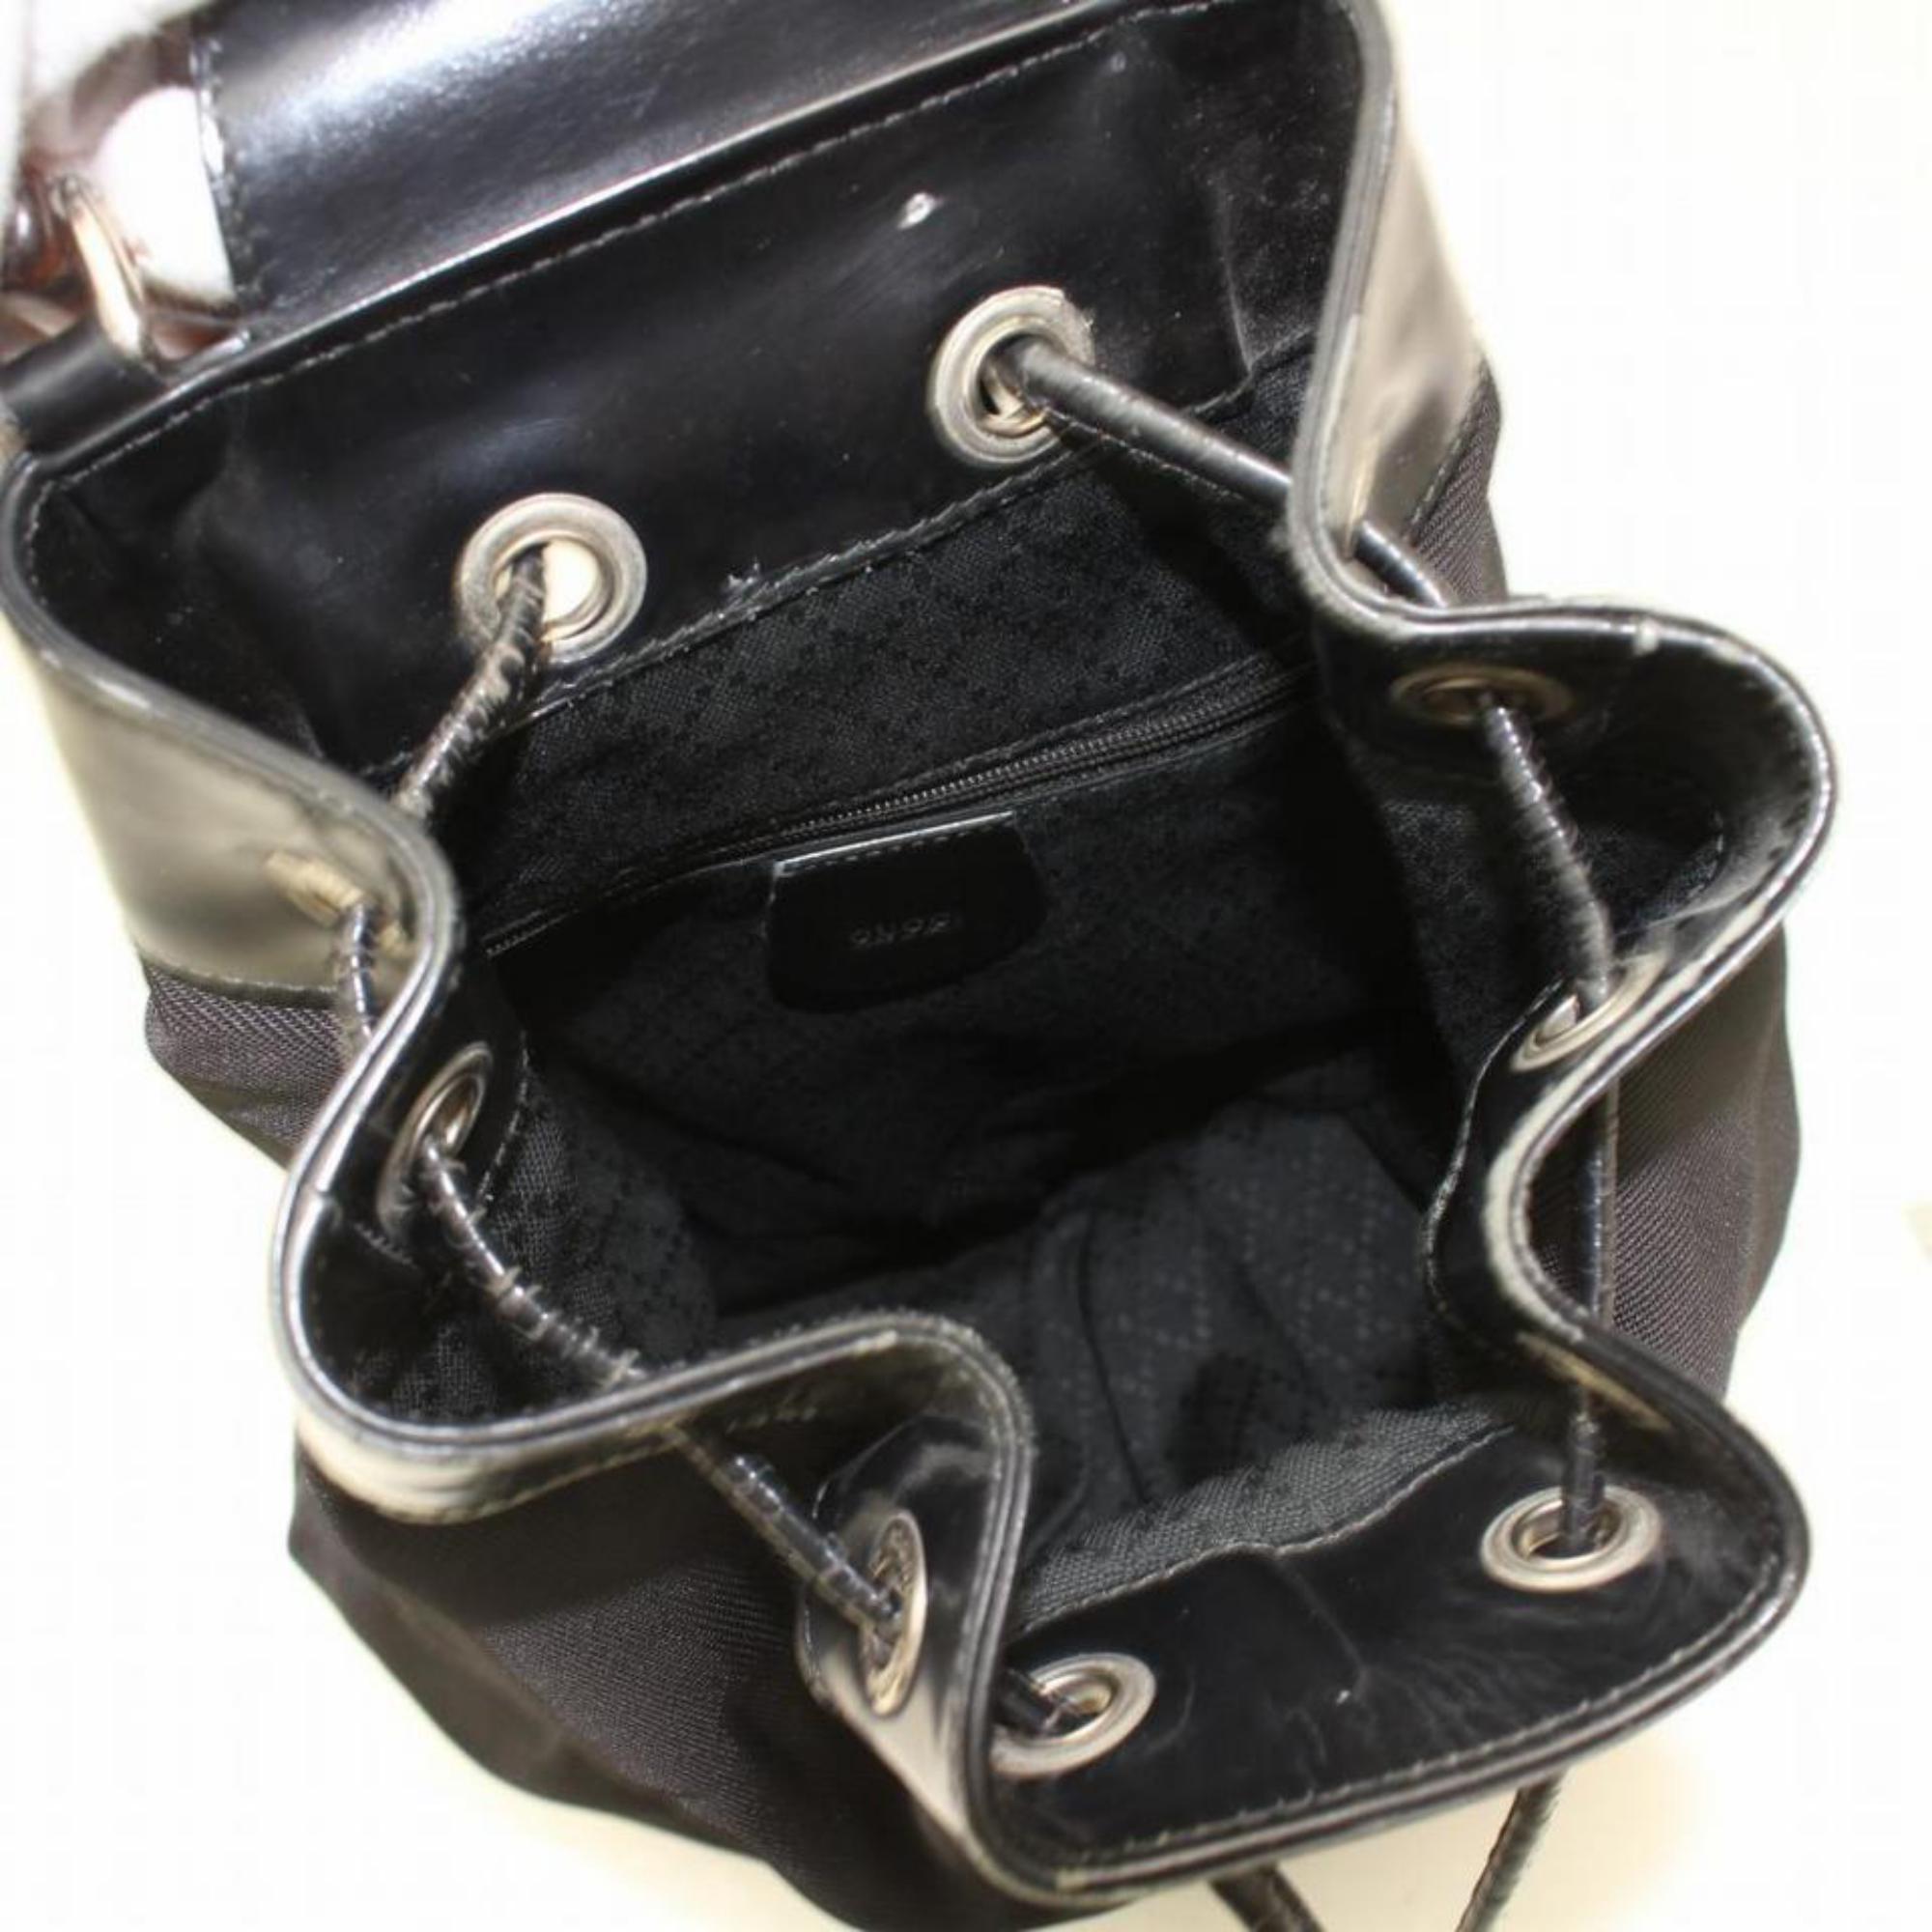 f0a68b93b98 Gucci Bamboo Drawstring Bucket Sling Backpack 869292 Black Nylon Shoulder  Bag For Sale at 1stdibs